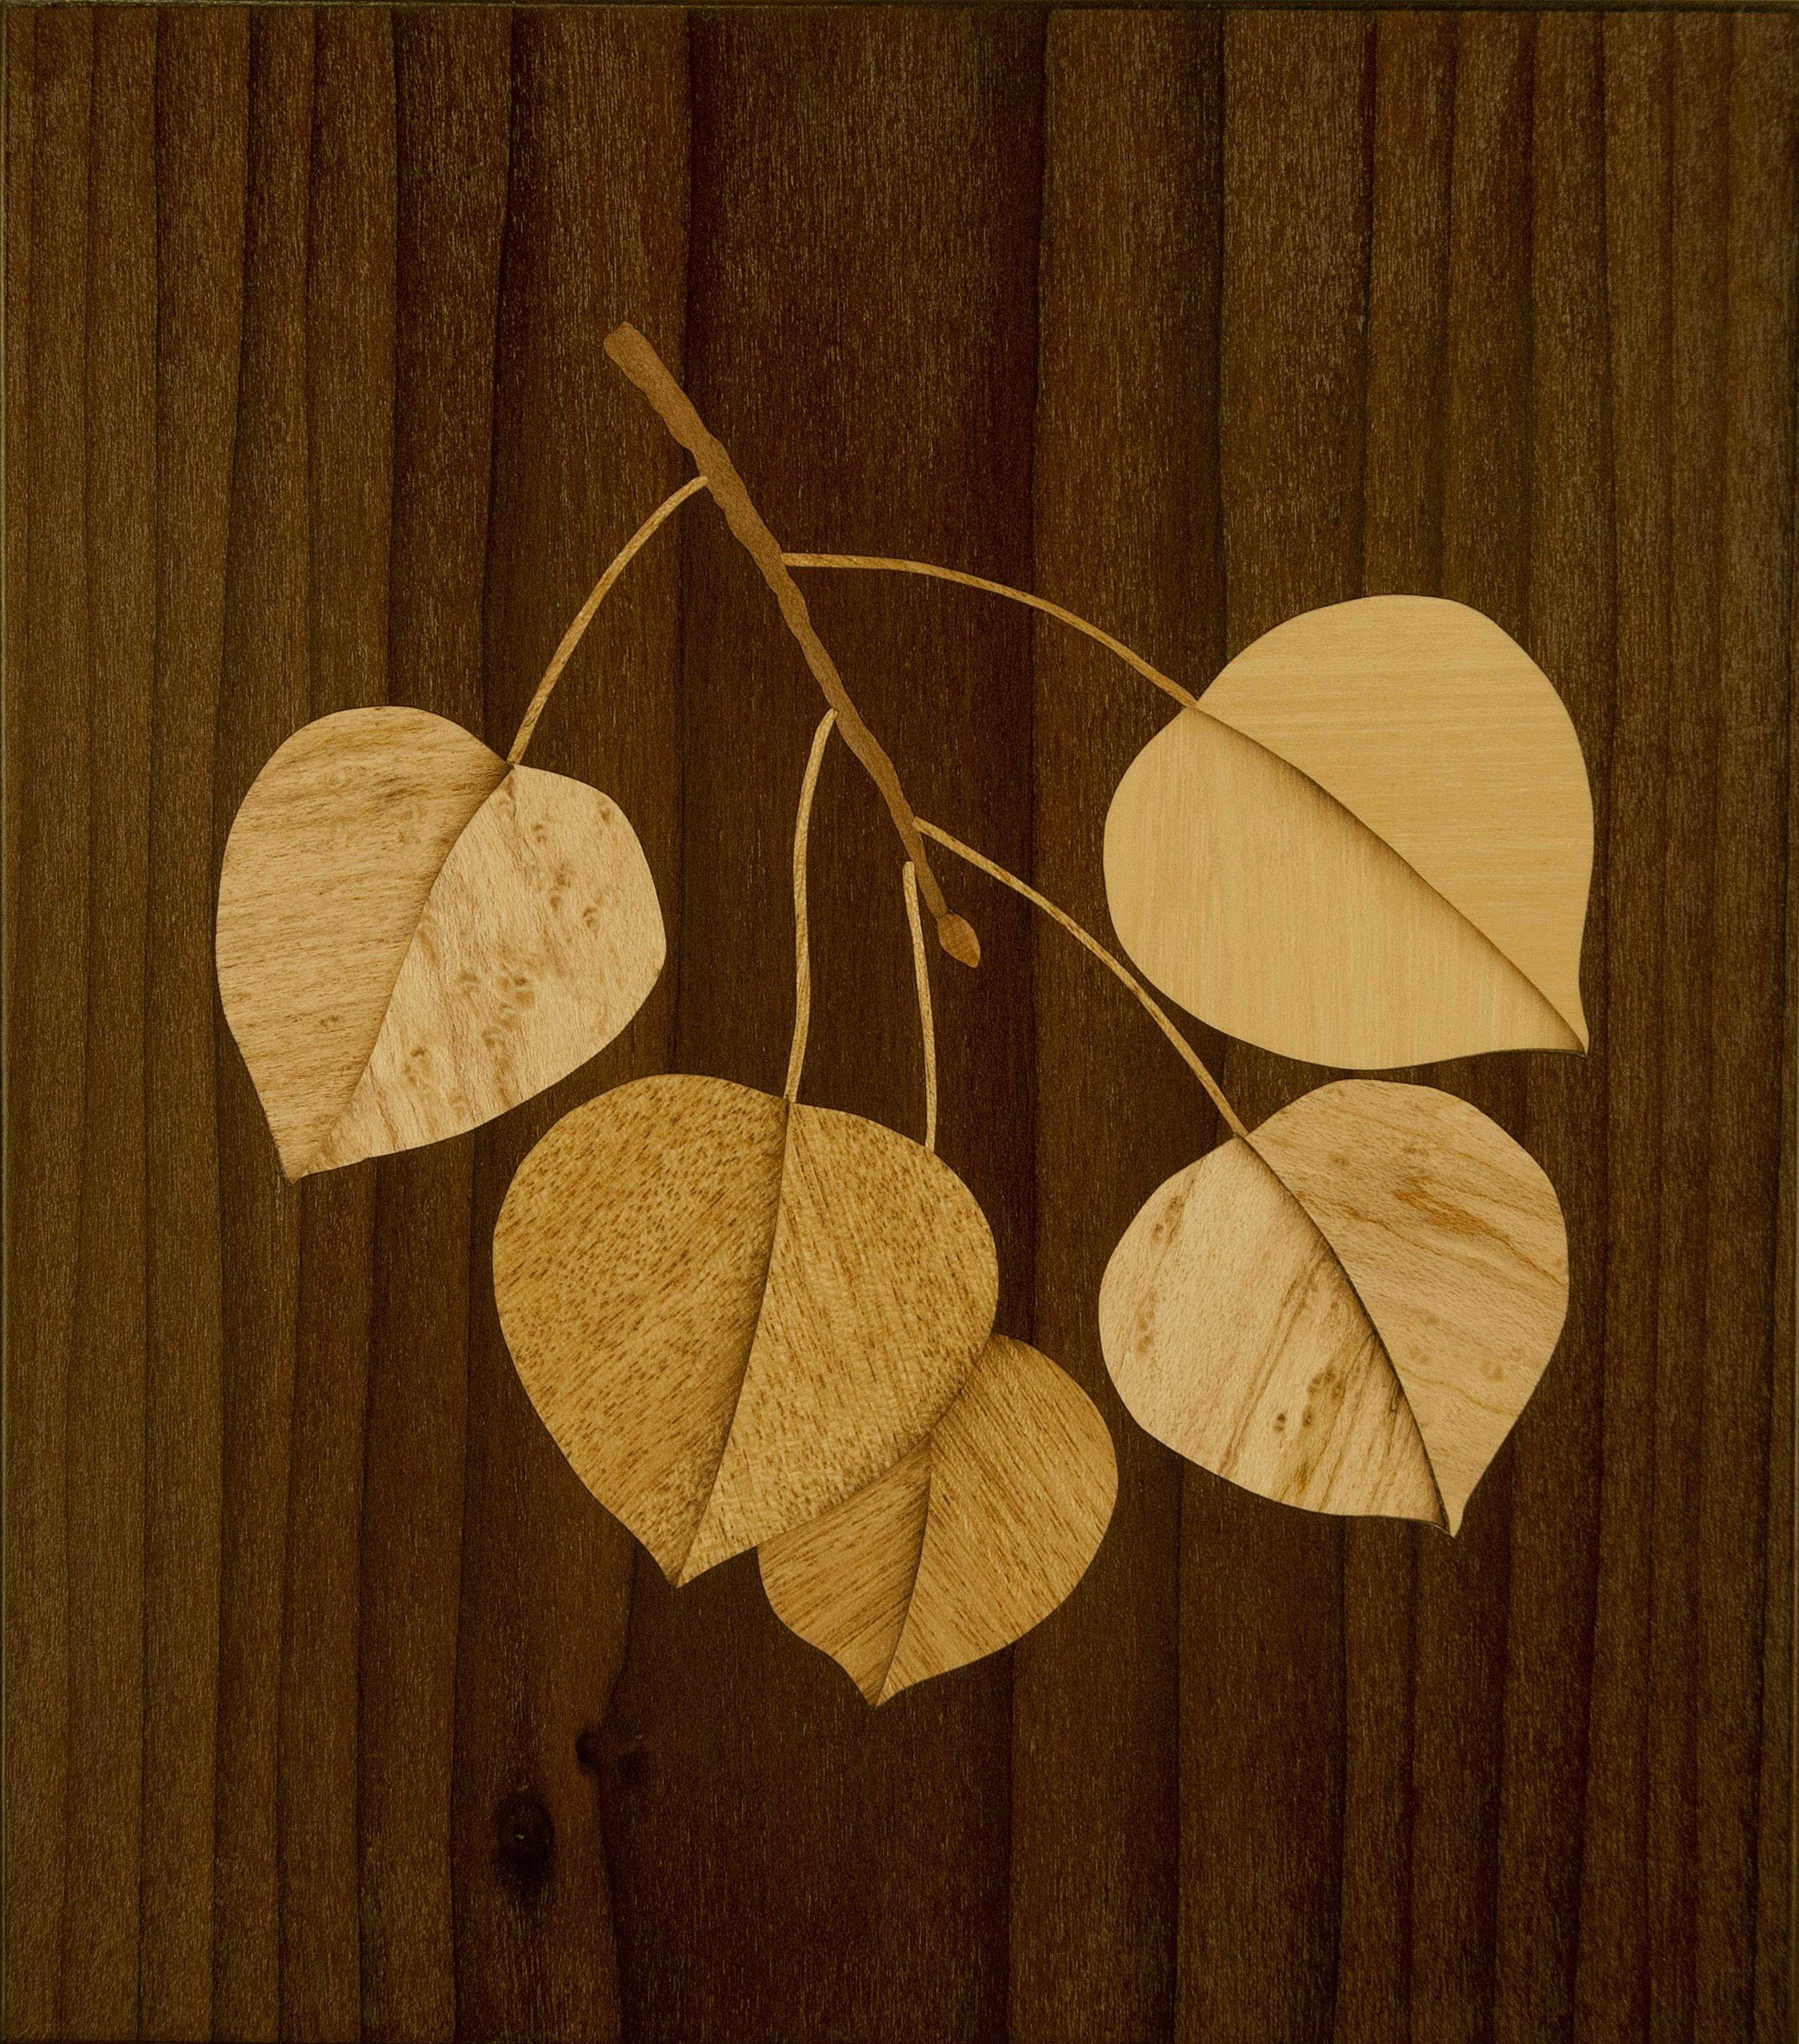 """Golden Aspen"", wood, 7"" x 6.5"", $450"